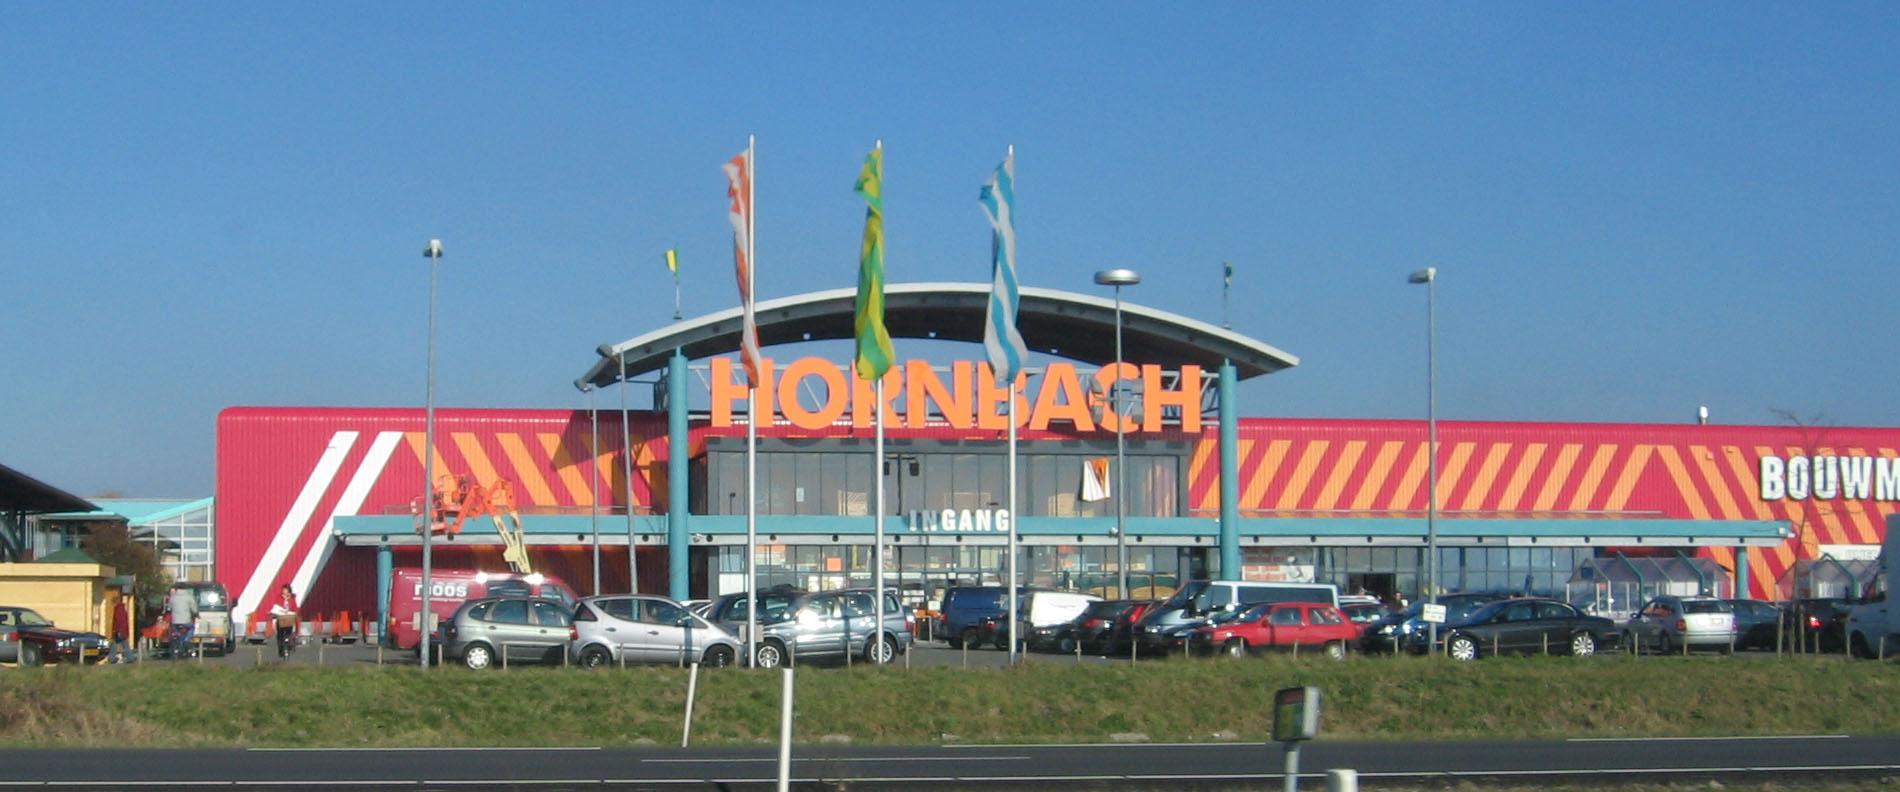 Hornbach_Wateringen.jpg.4f5f8d047c8c26c0f804c369108e3ddd.jpg